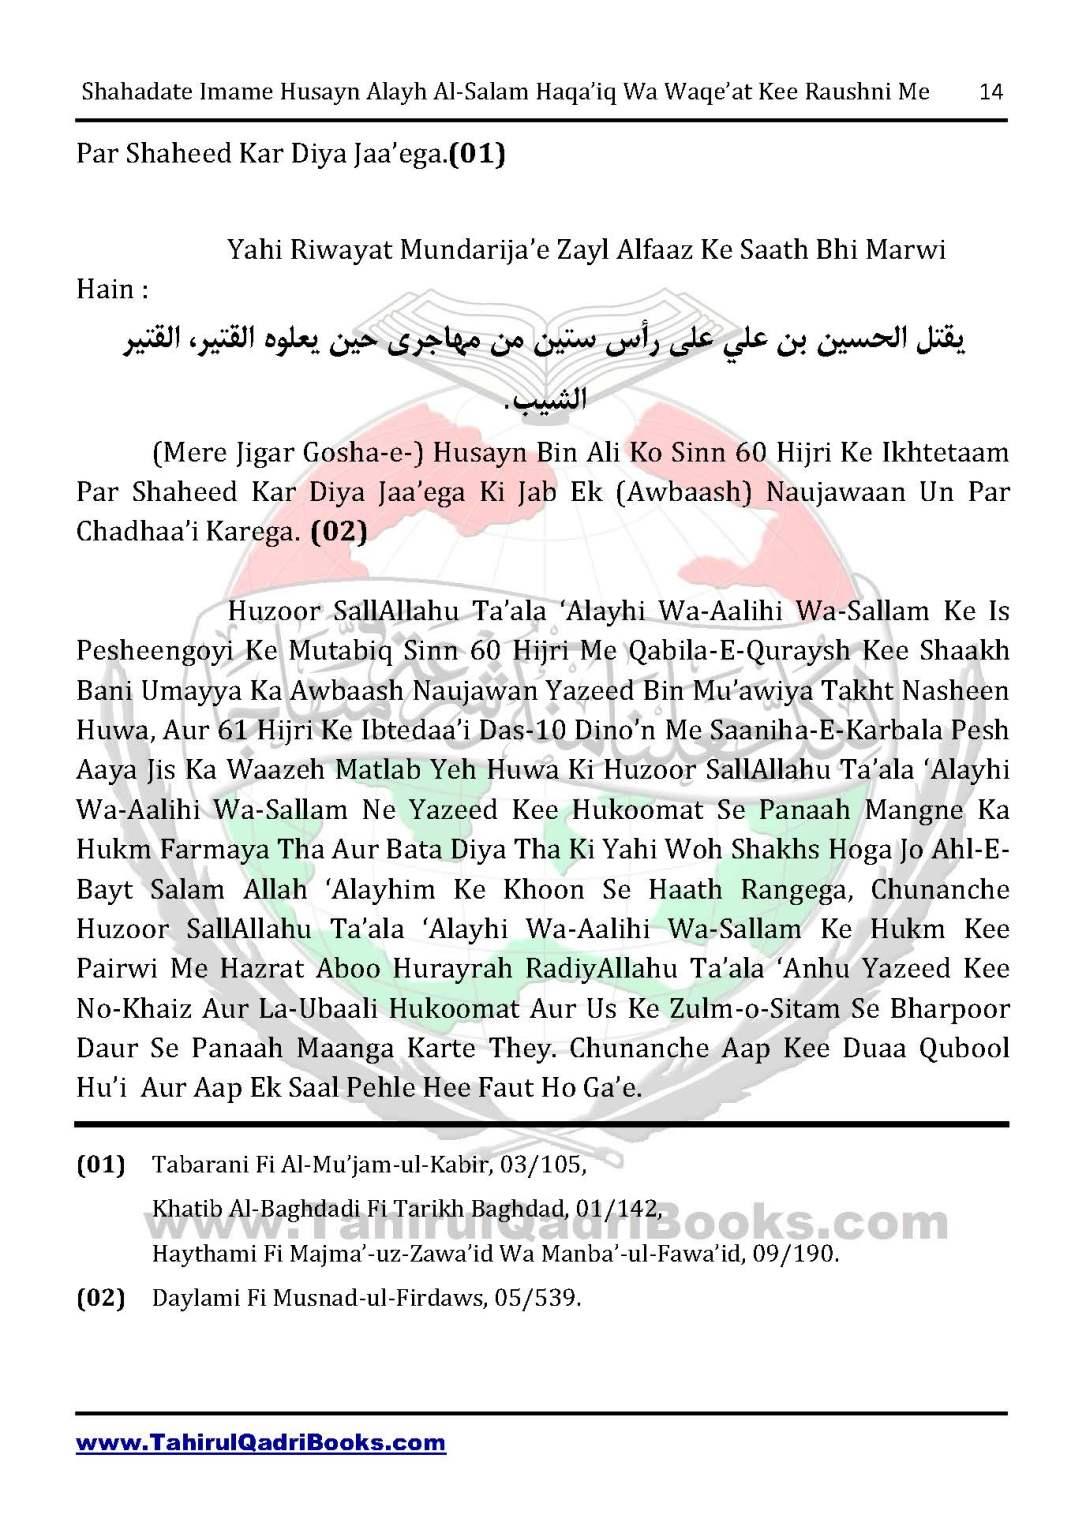 shahadate-imame-husayn-alayh-is-salam-haqaiq-wa-waqe_at-kee-raushni-me-in-roman-urdu-unlocked_Page_14